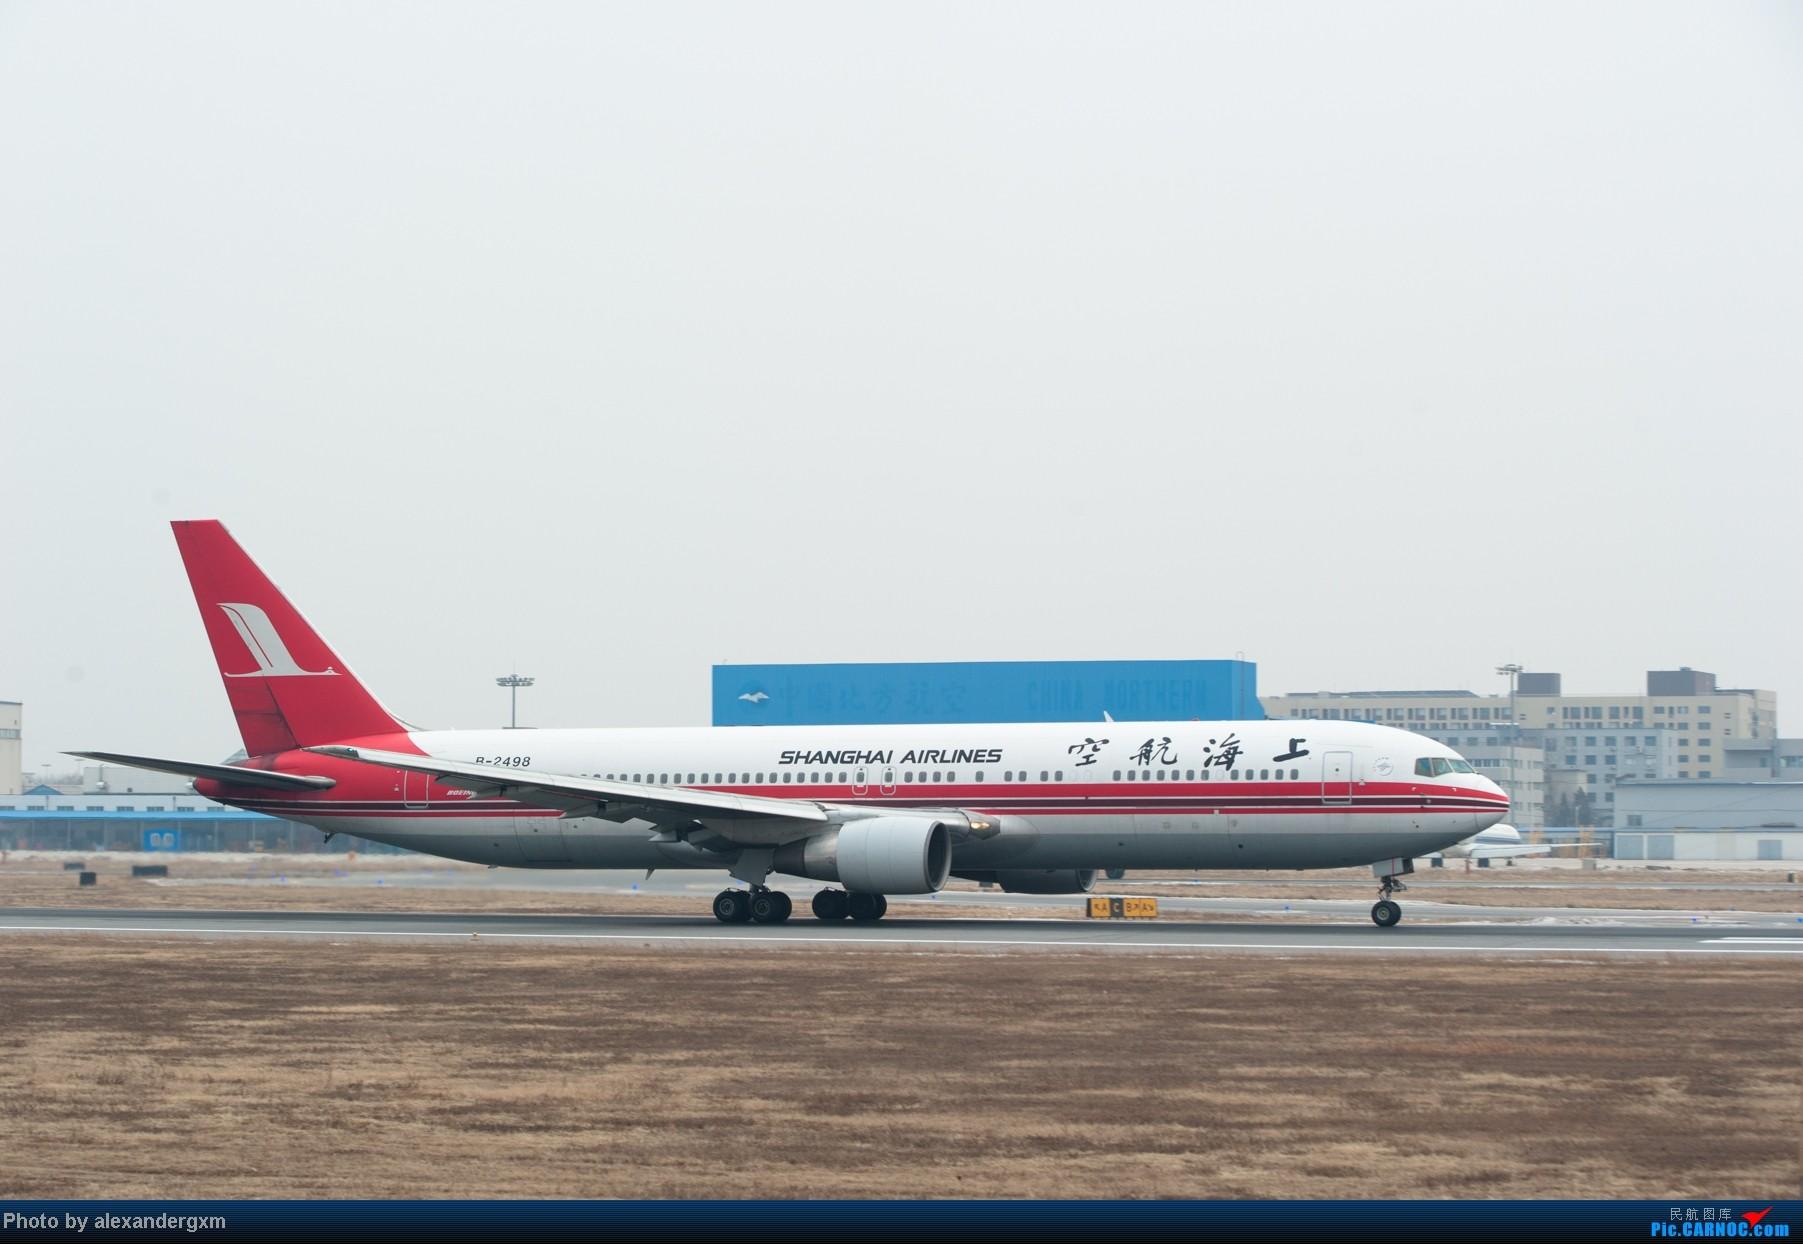 Re:[原创]【SHE】1月27日,桃仙的大灰机和小灰机。 BOEING 767-300 B-2498 中国沈阳桃仙机场